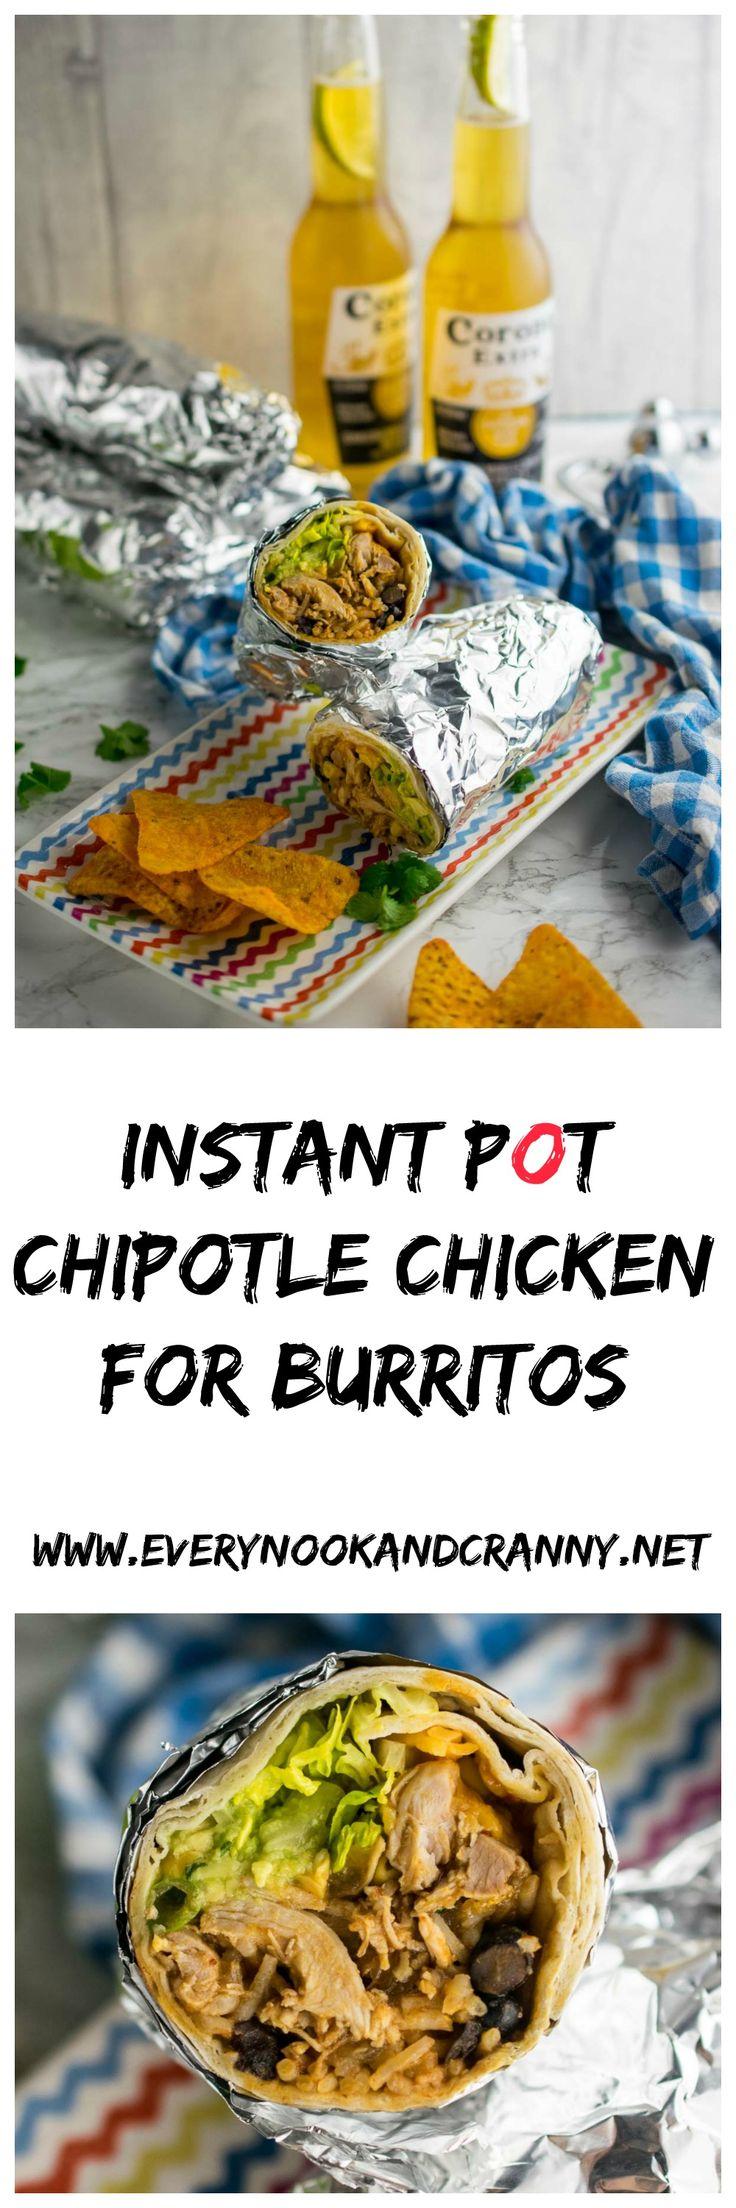 Instant Pot chipotle chicken for burritos